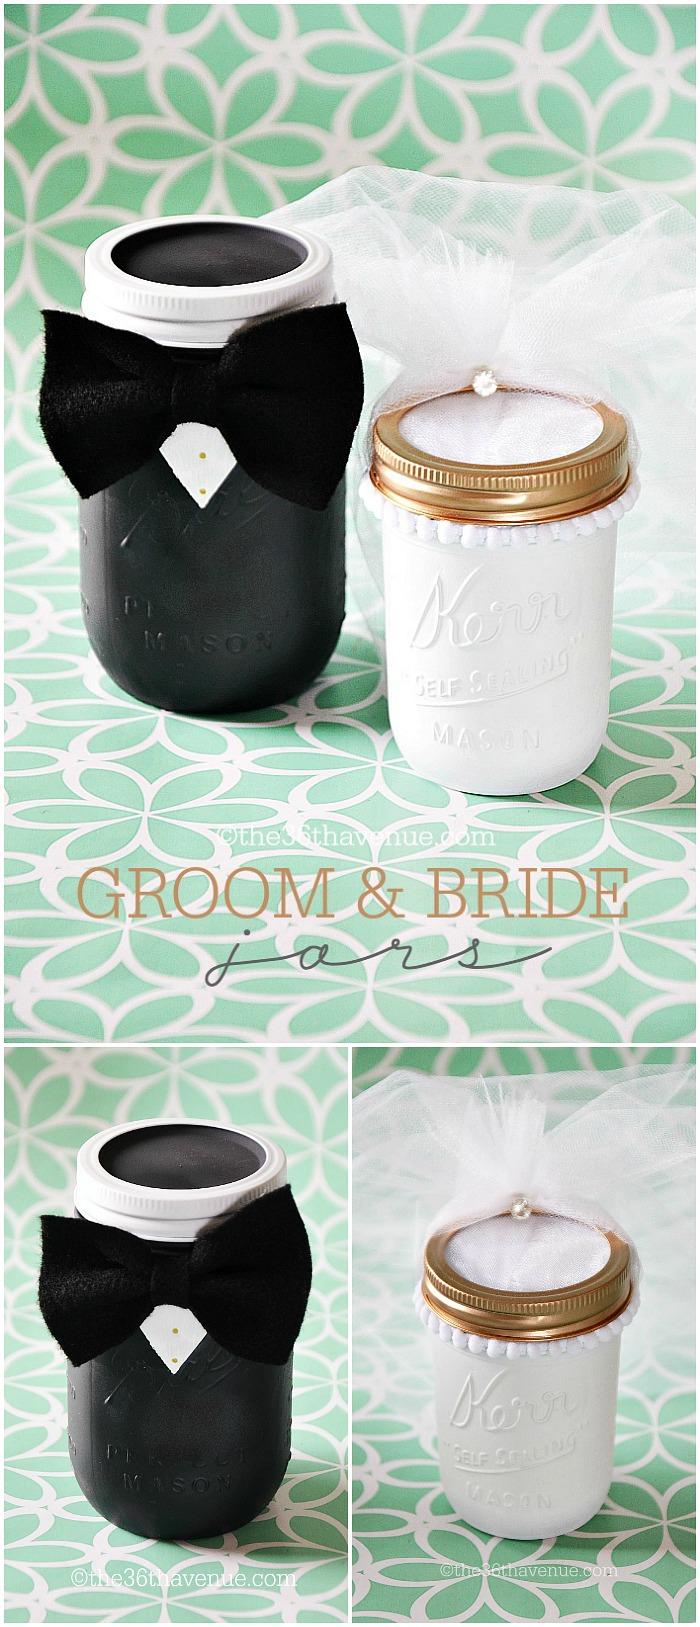 Mason Jar Crafts Groom Bride The 36th Avenue